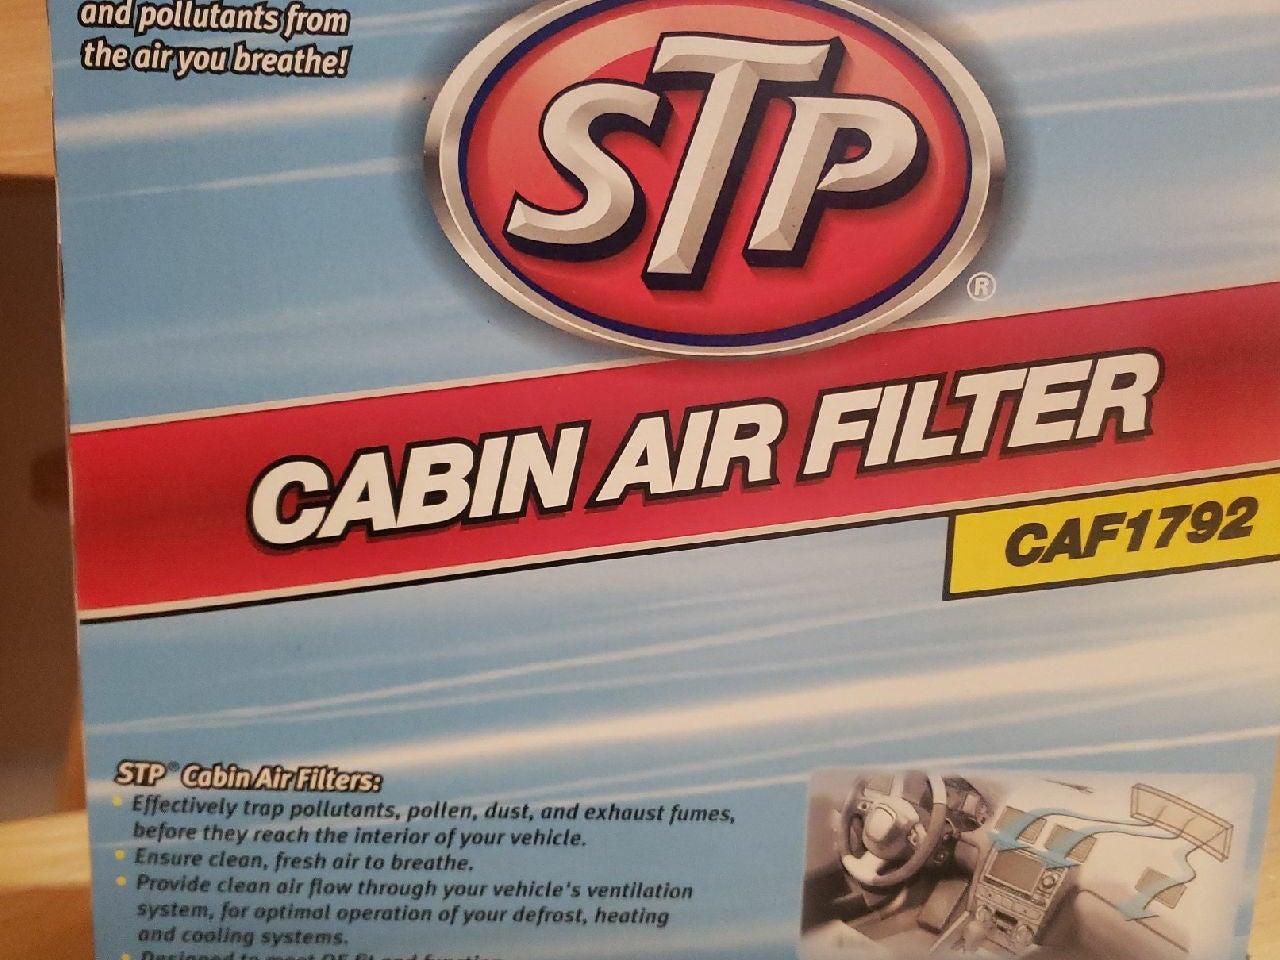 Stp caf1792 air filter